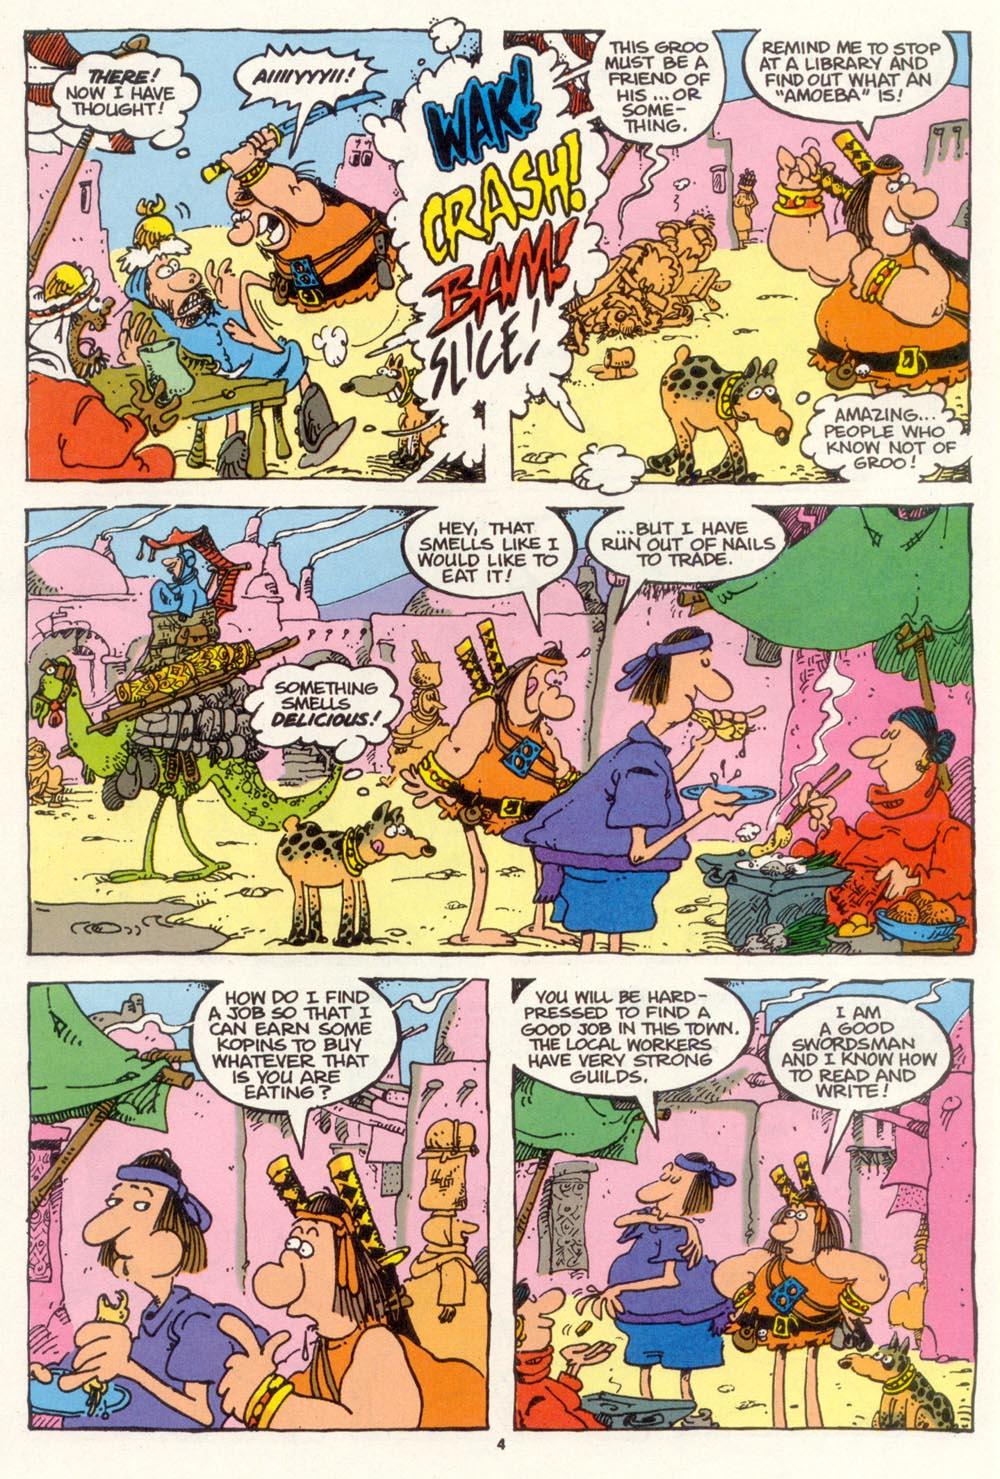 Read online Sergio Aragonés Groo the Wanderer comic -  Issue #102 - 6